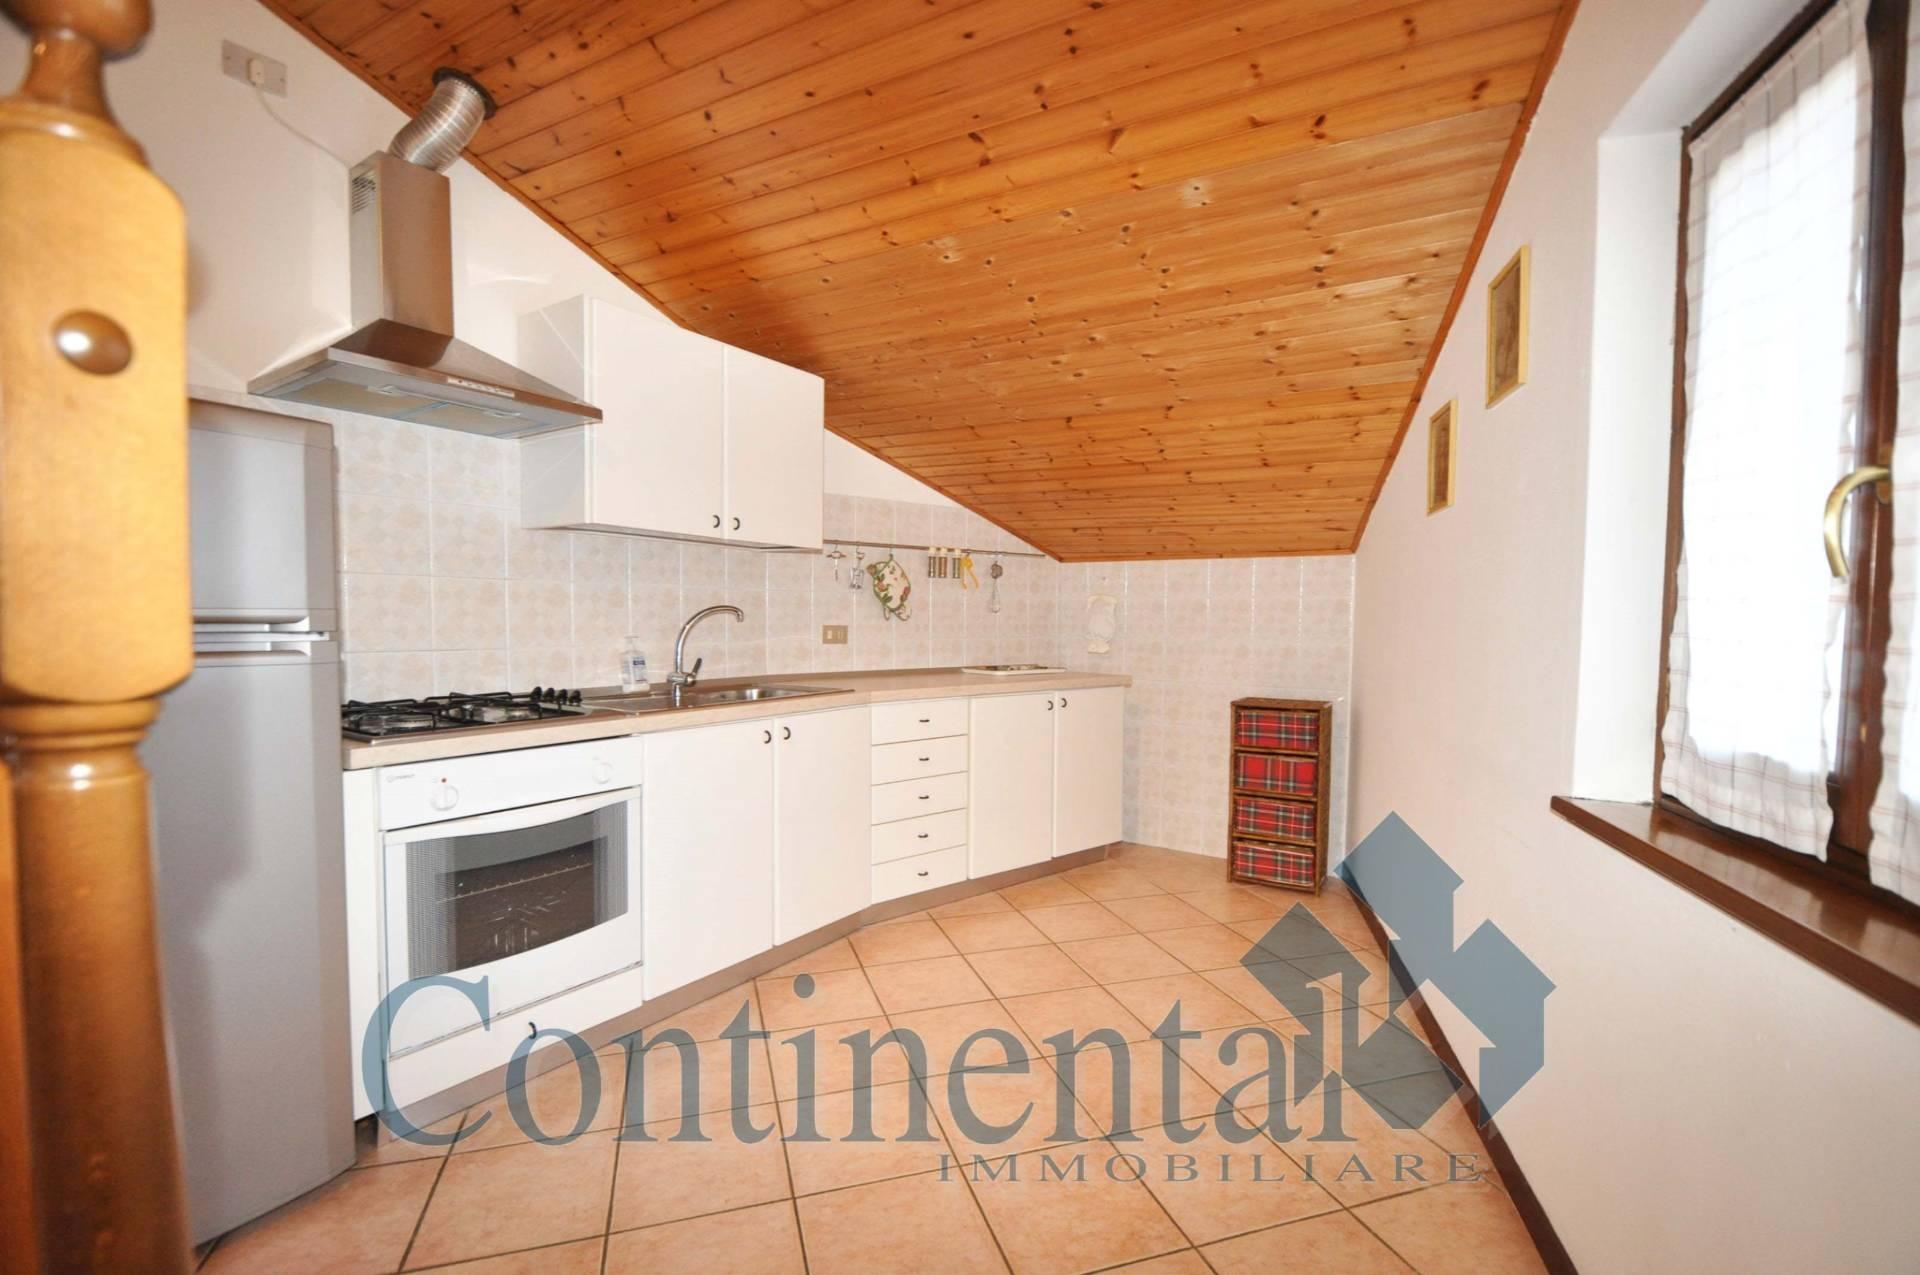 Foto 6 di Rustico / Casale Via Muggiasca, Santa Brigida